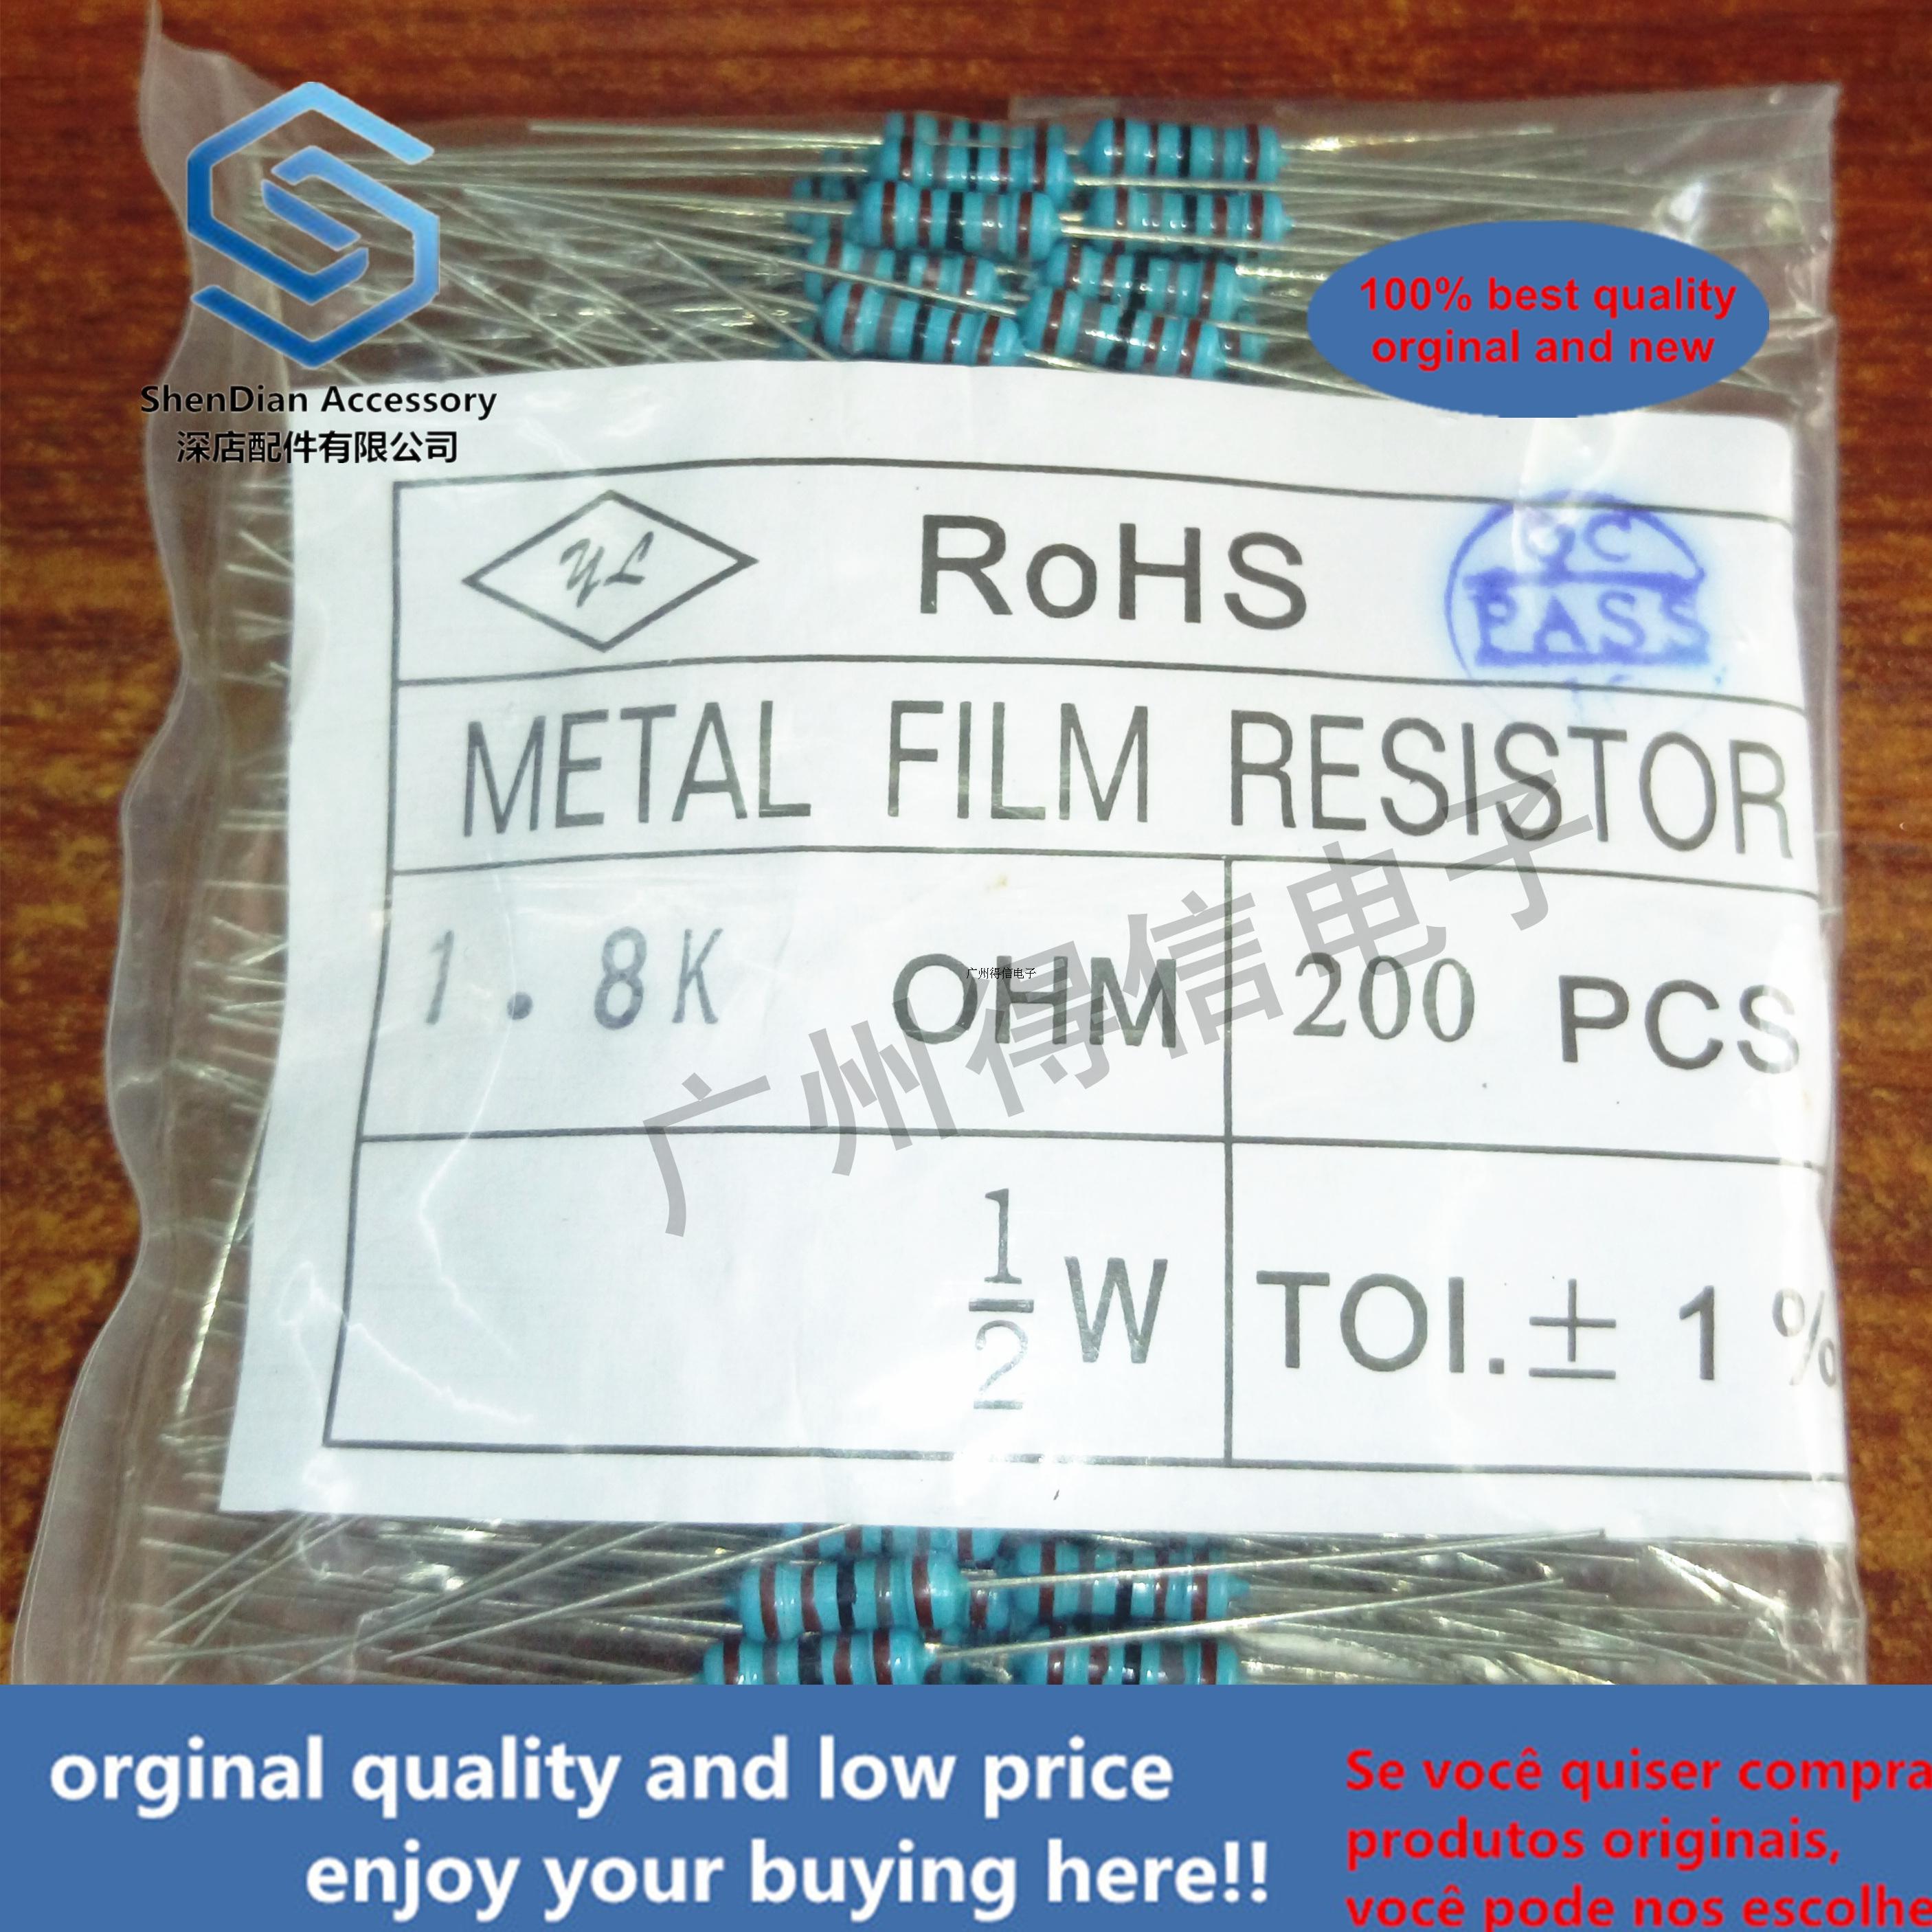 200pcs 1 / 2W 51R 51Euro 1% Brand New Metal Film Iron Feet Resistance Bag 200pcs Per Pack